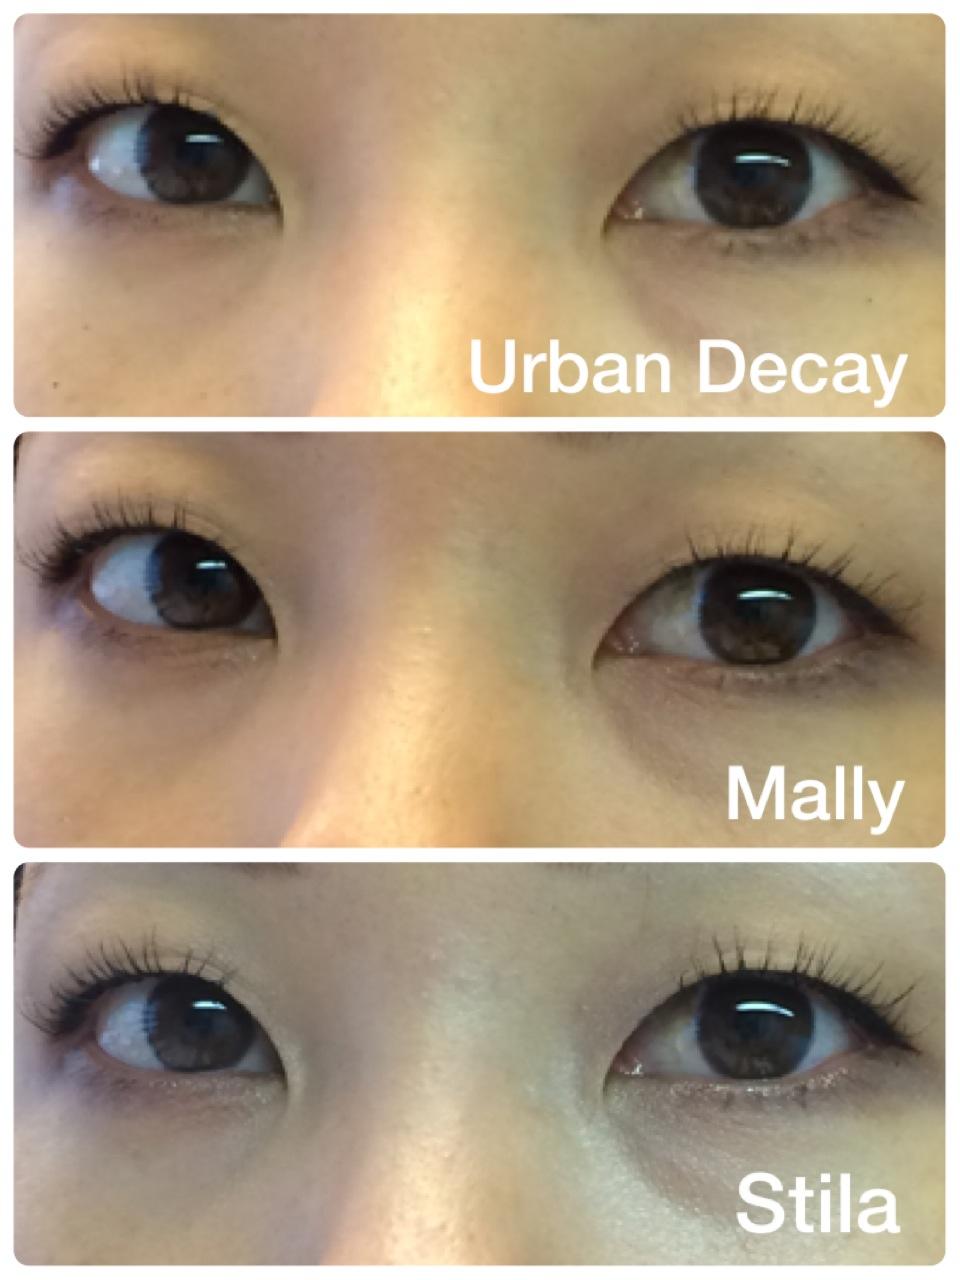 9a43a21fa95 04 Urban Decay Canonball Mally Volumizing Mascara Stila All Day Volumizing  Mascara Review Comparison ...